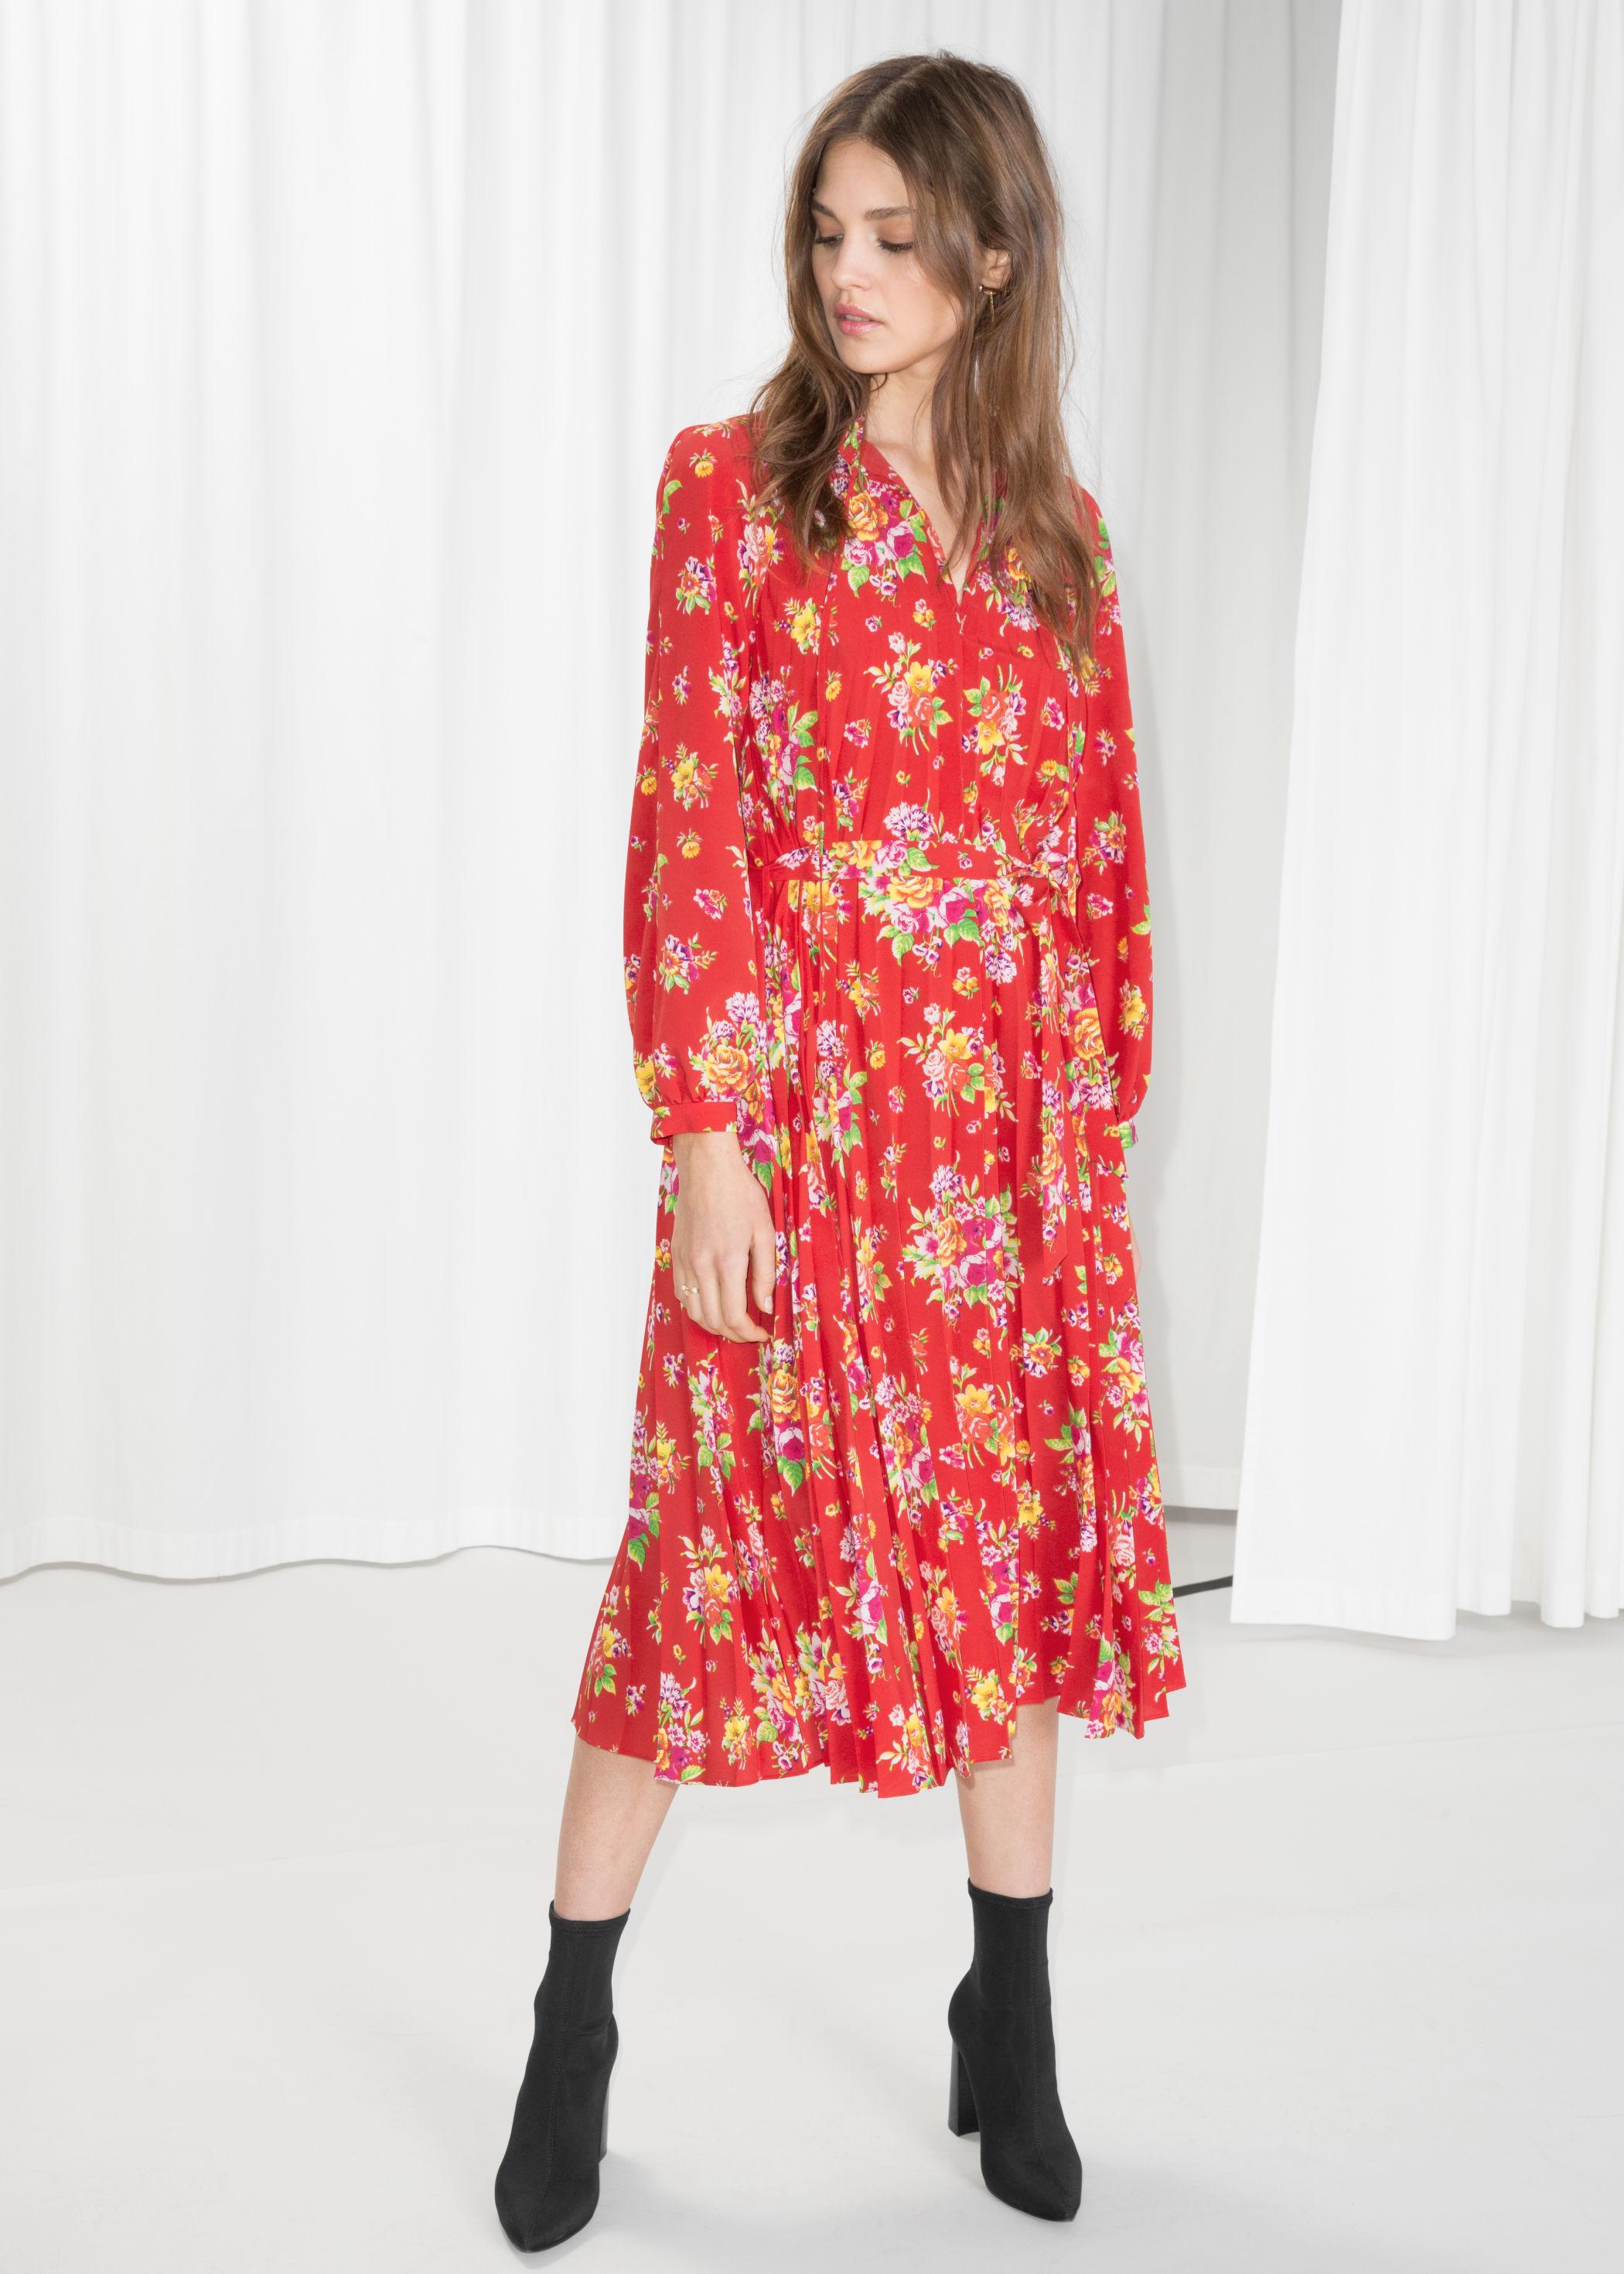 943c5a919c06 Pippa Middleton' Polo Ralph Lauren Dress & Similar Styles